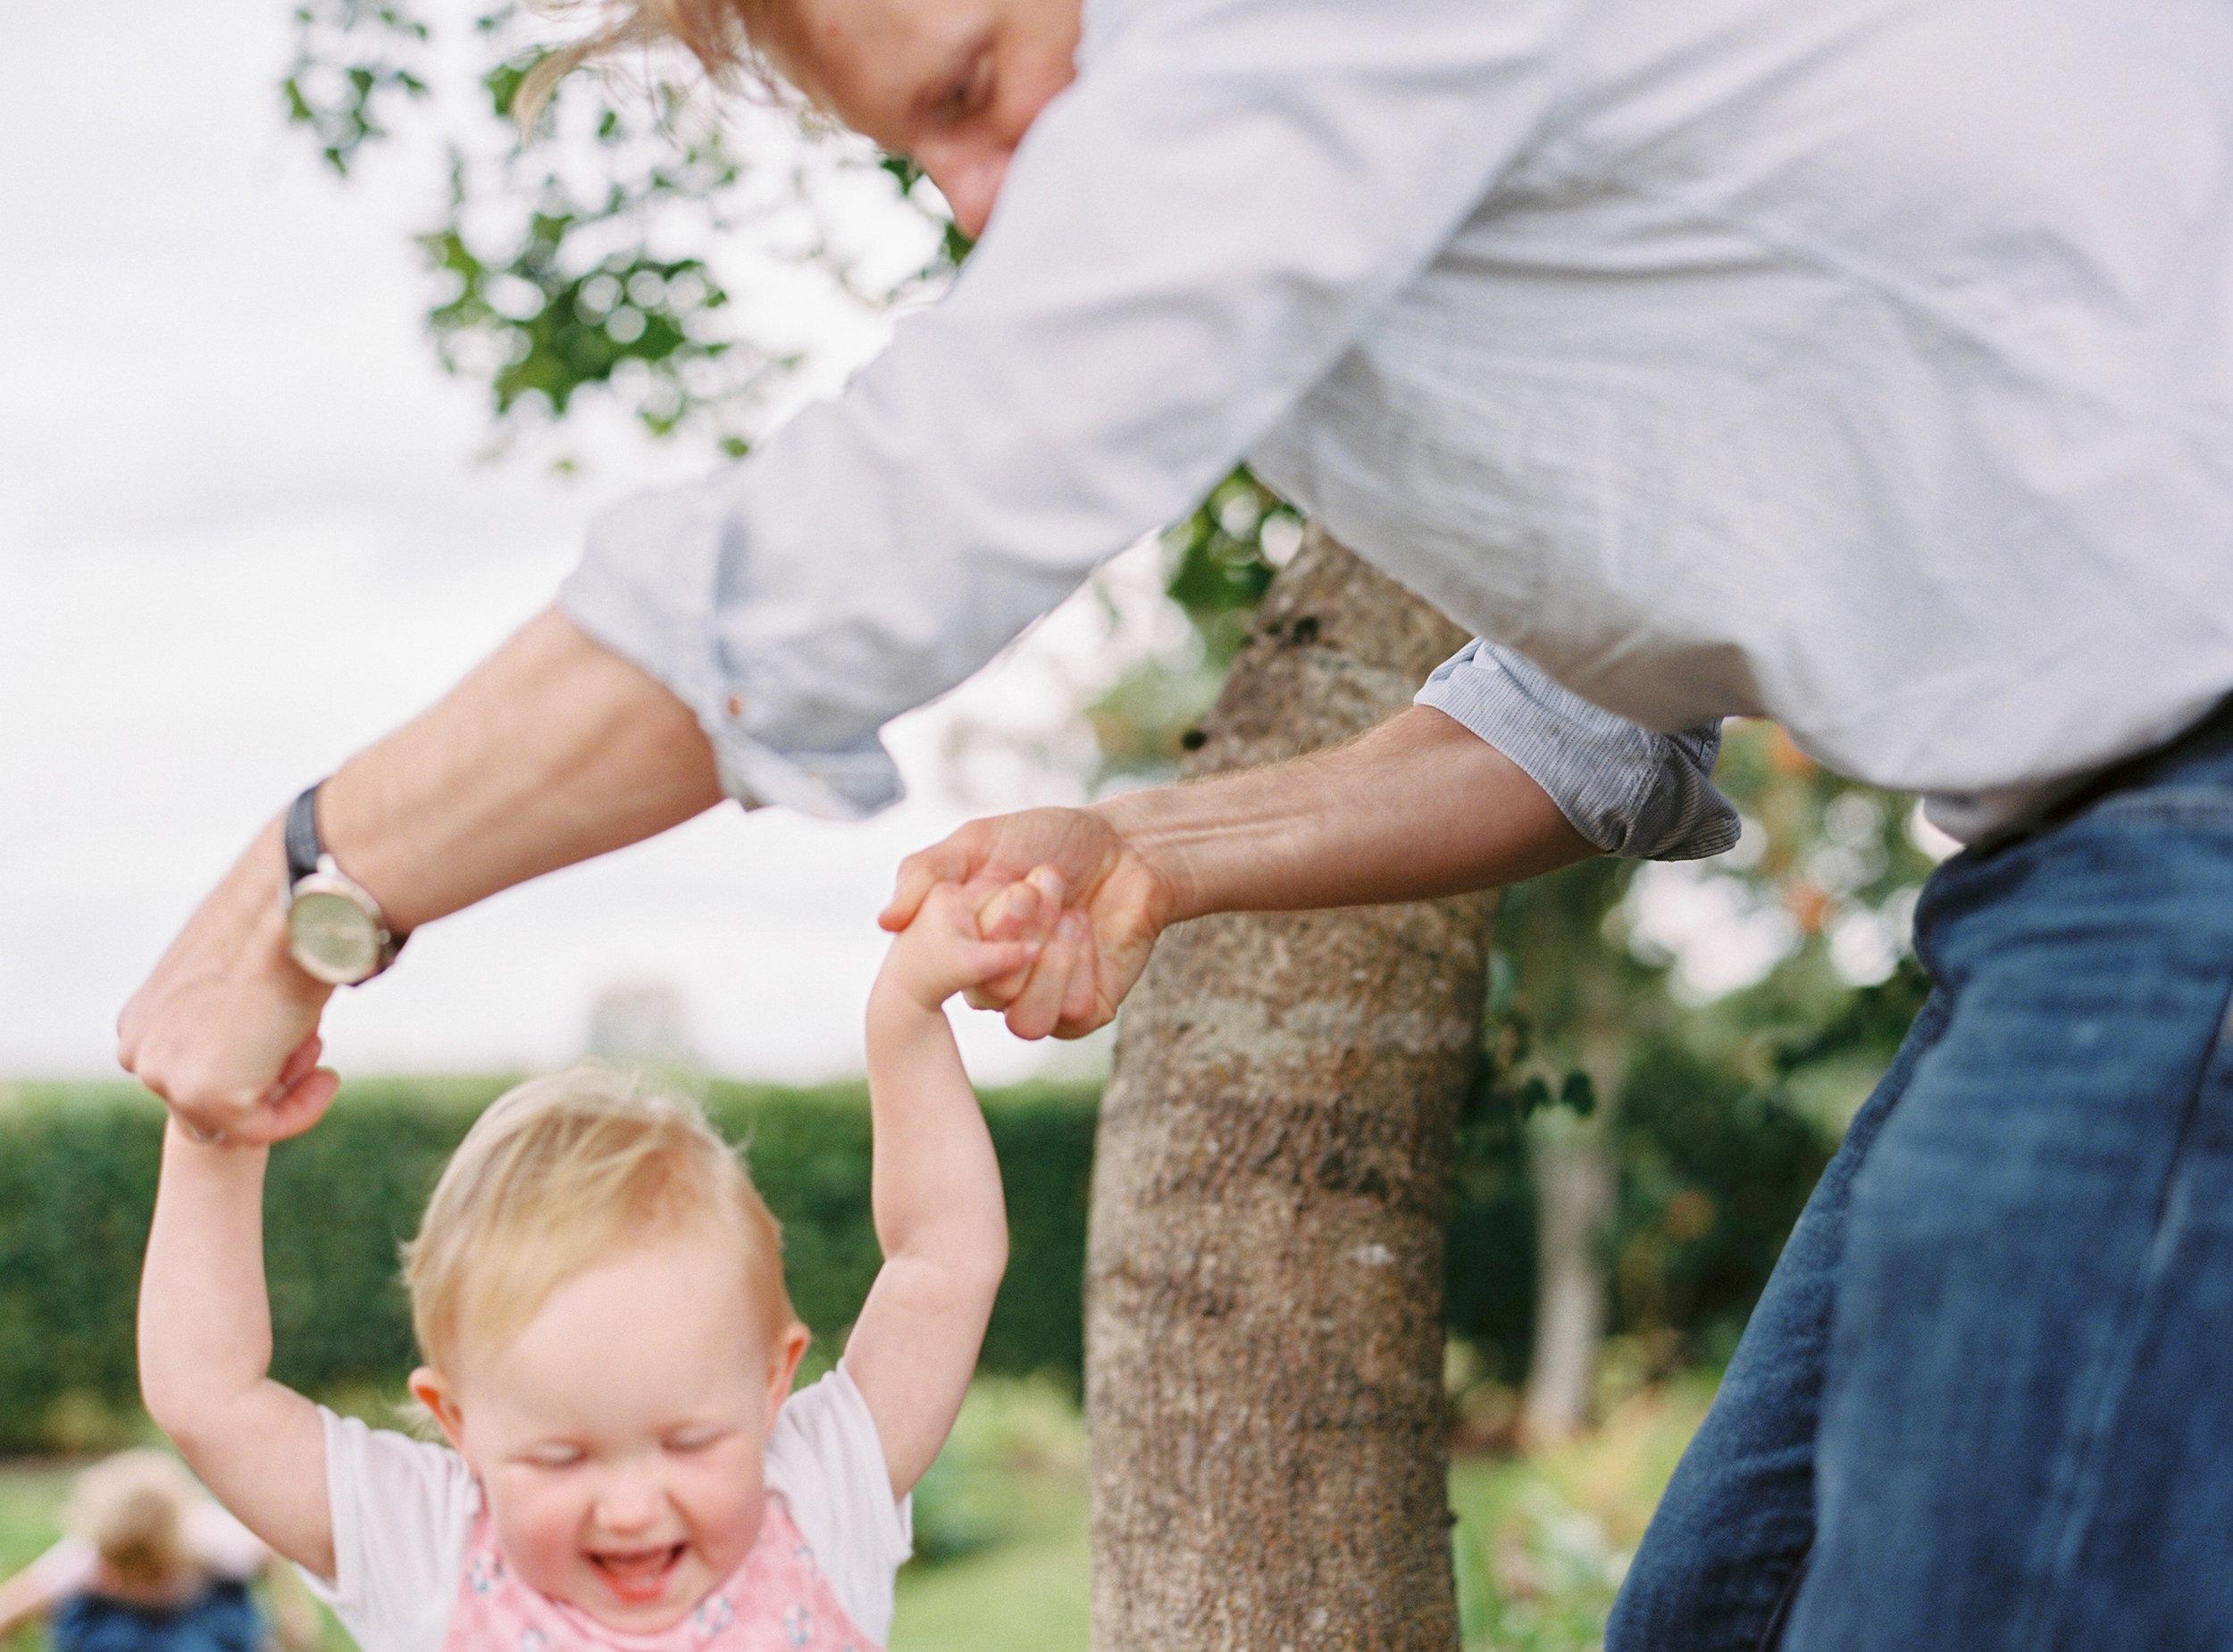 cumbria_family_photographer (32).jpg